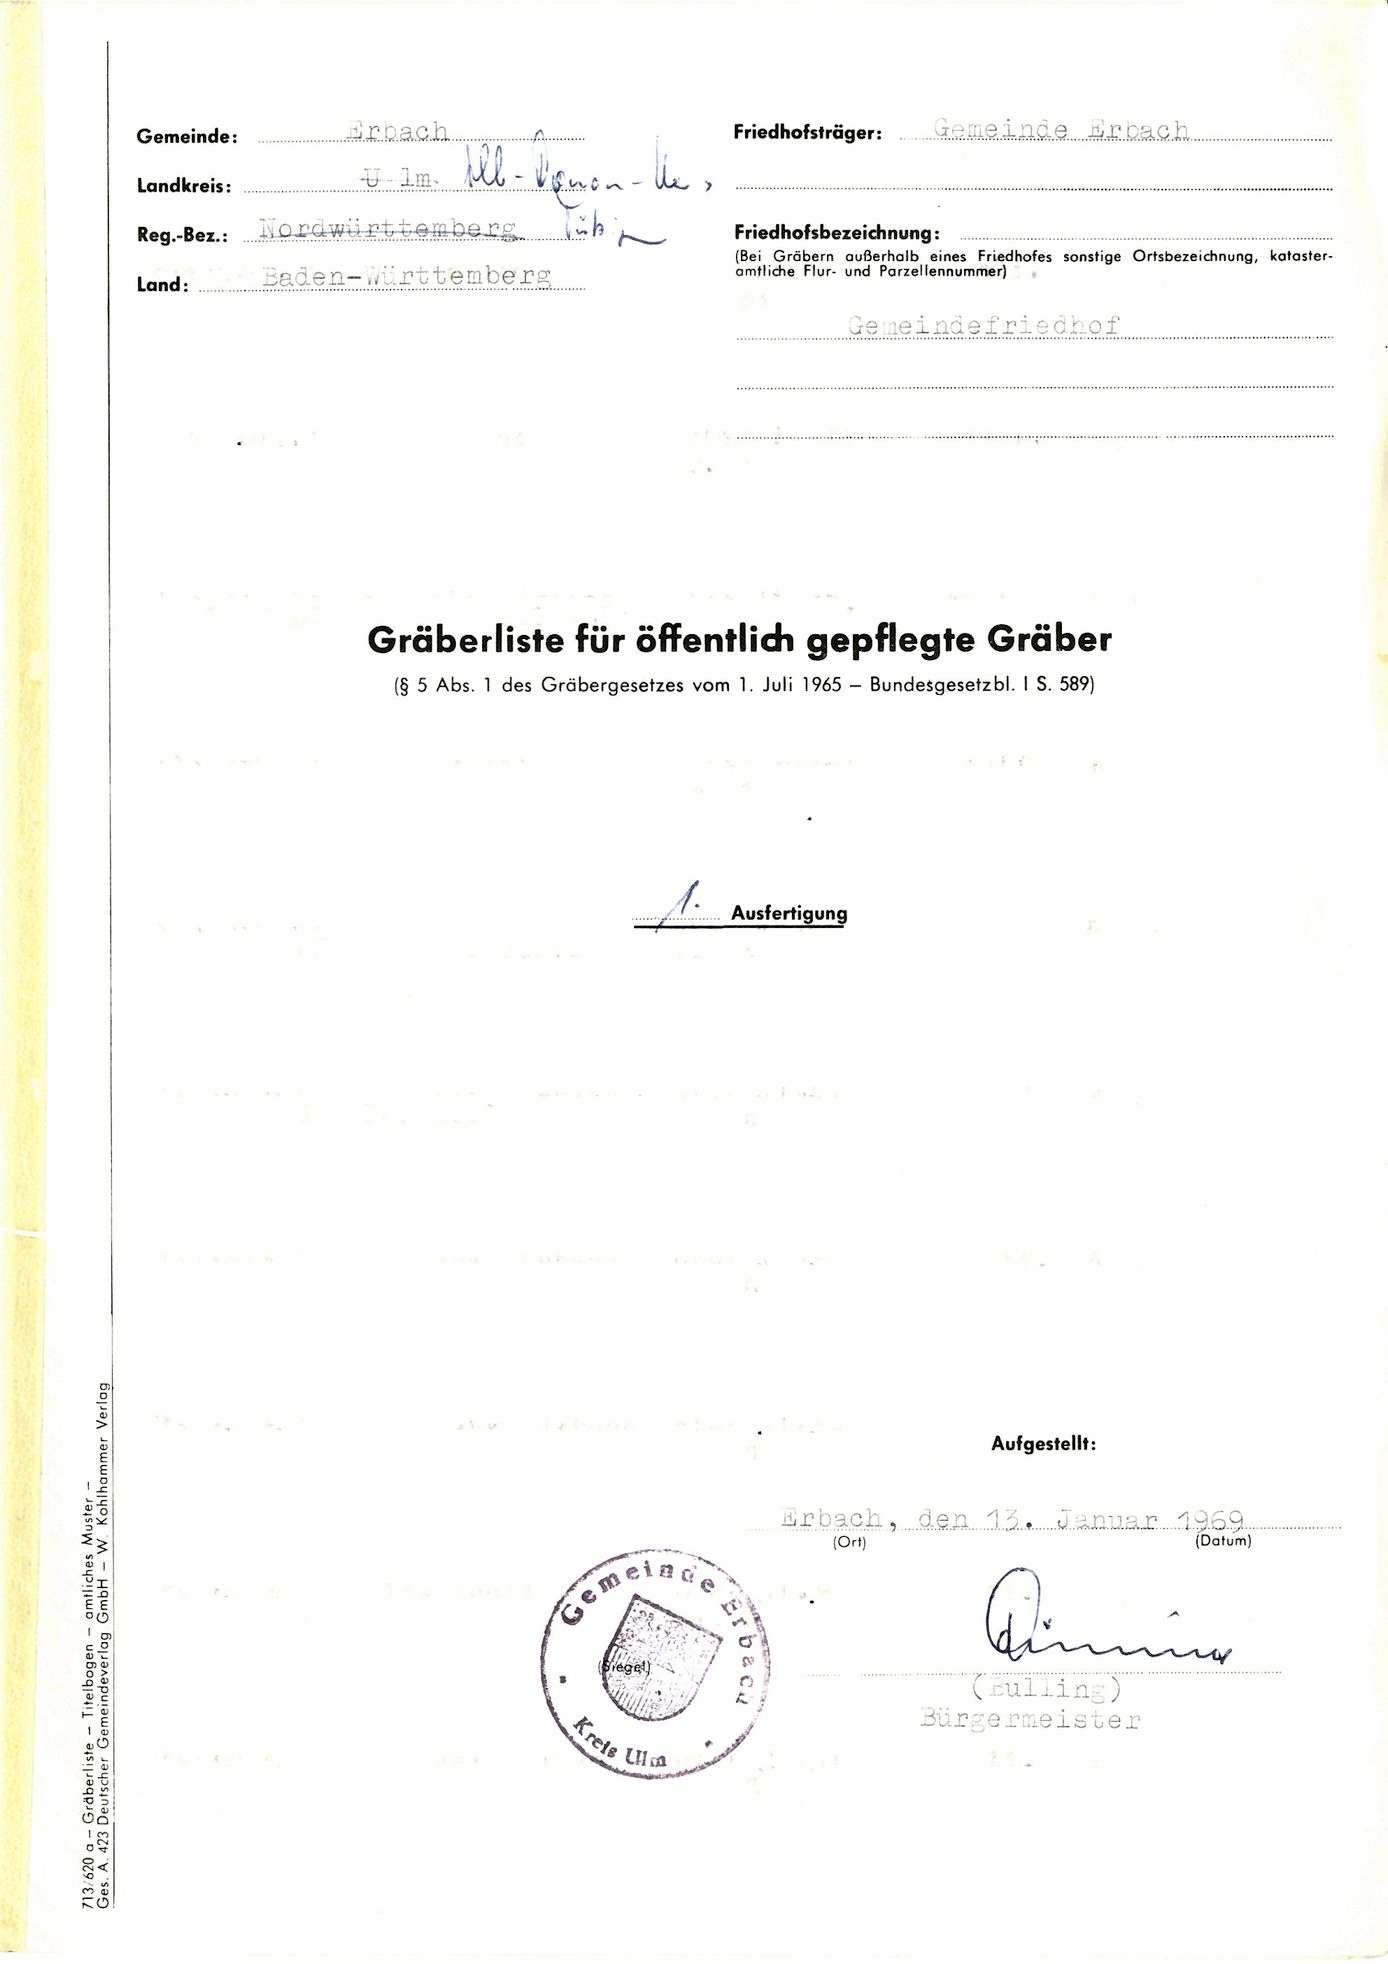 Erbach, Bild 1